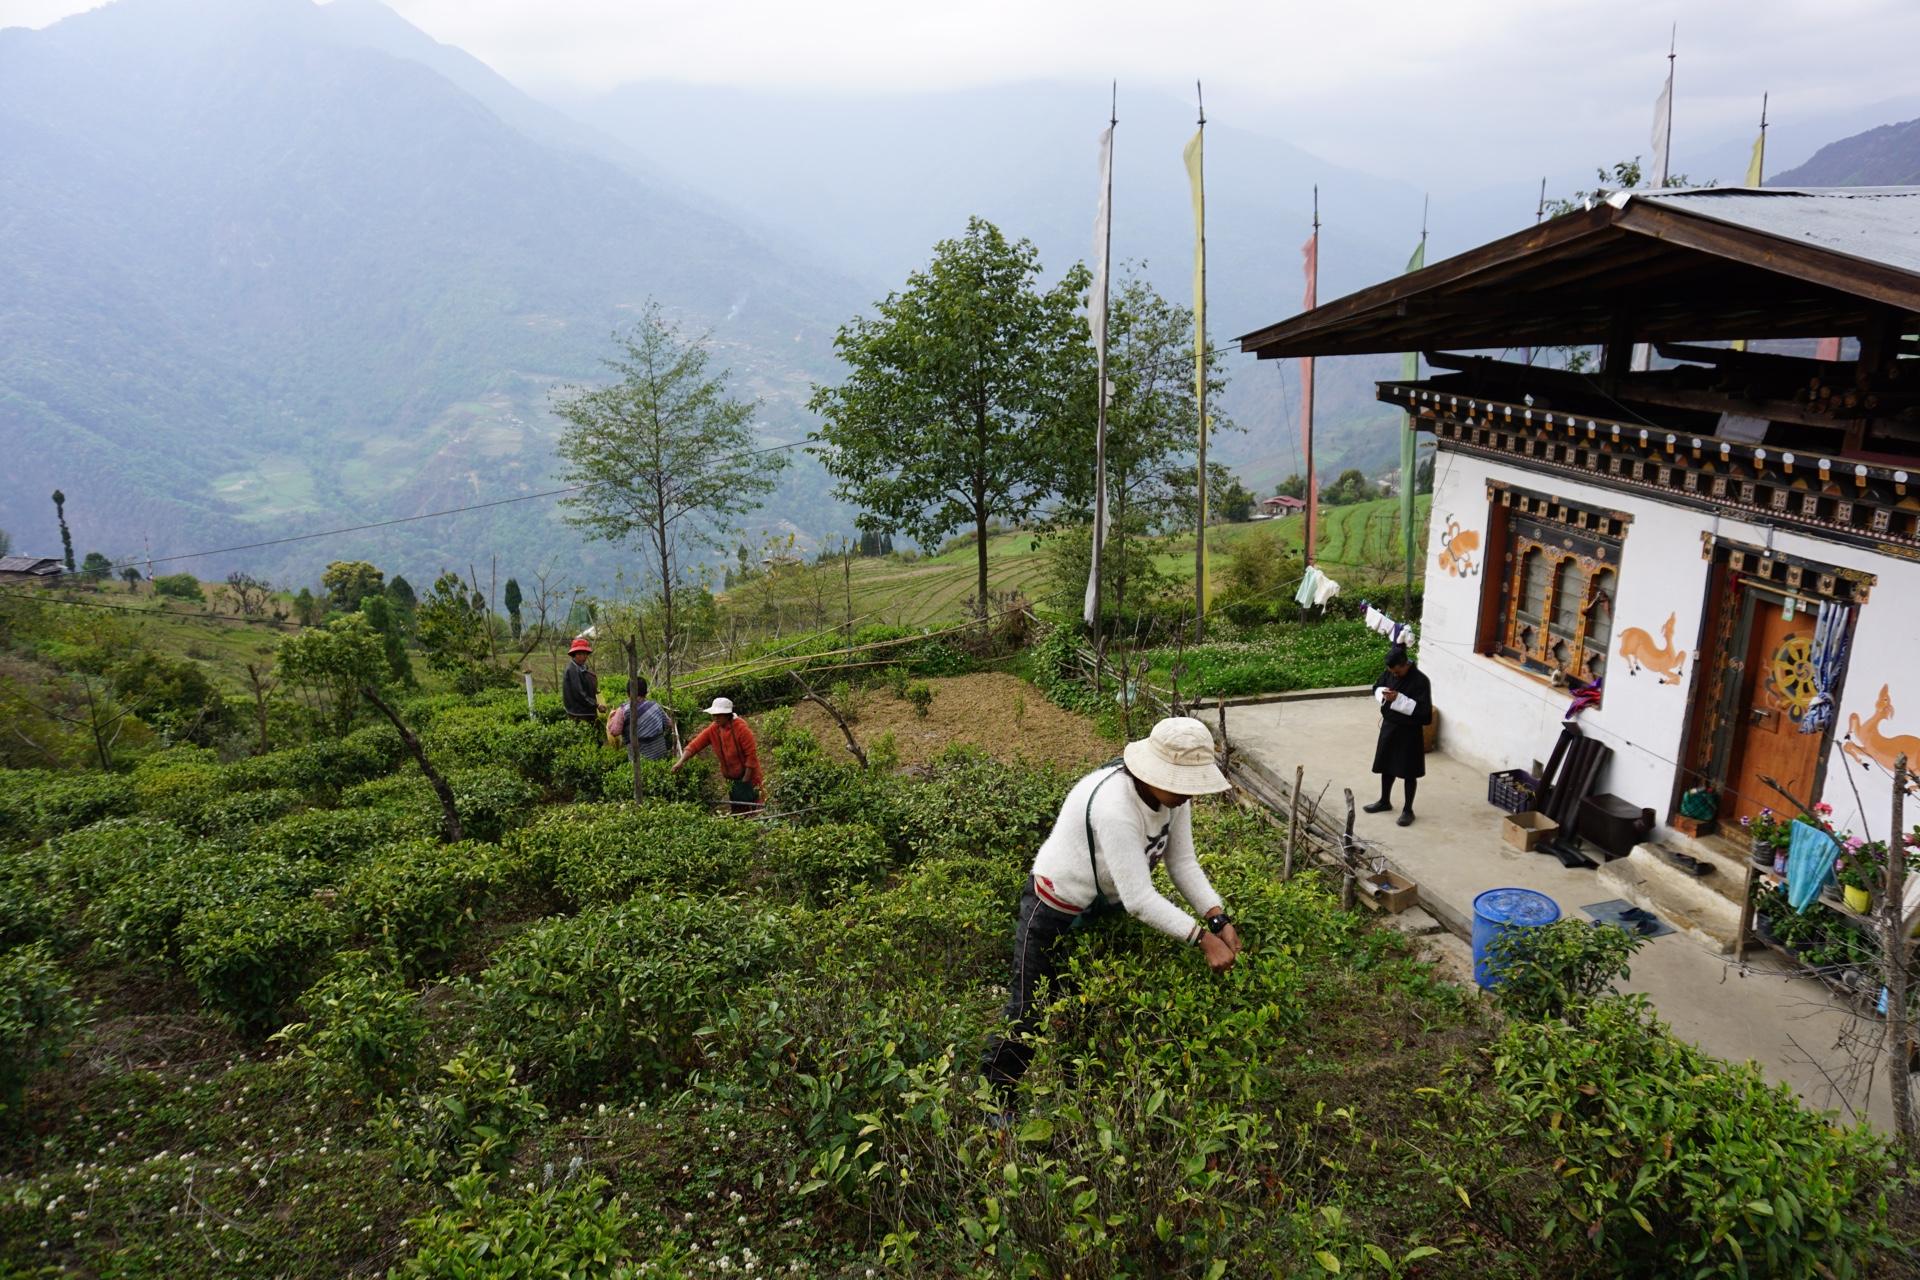 bhutan-green-tea-field.jpeg